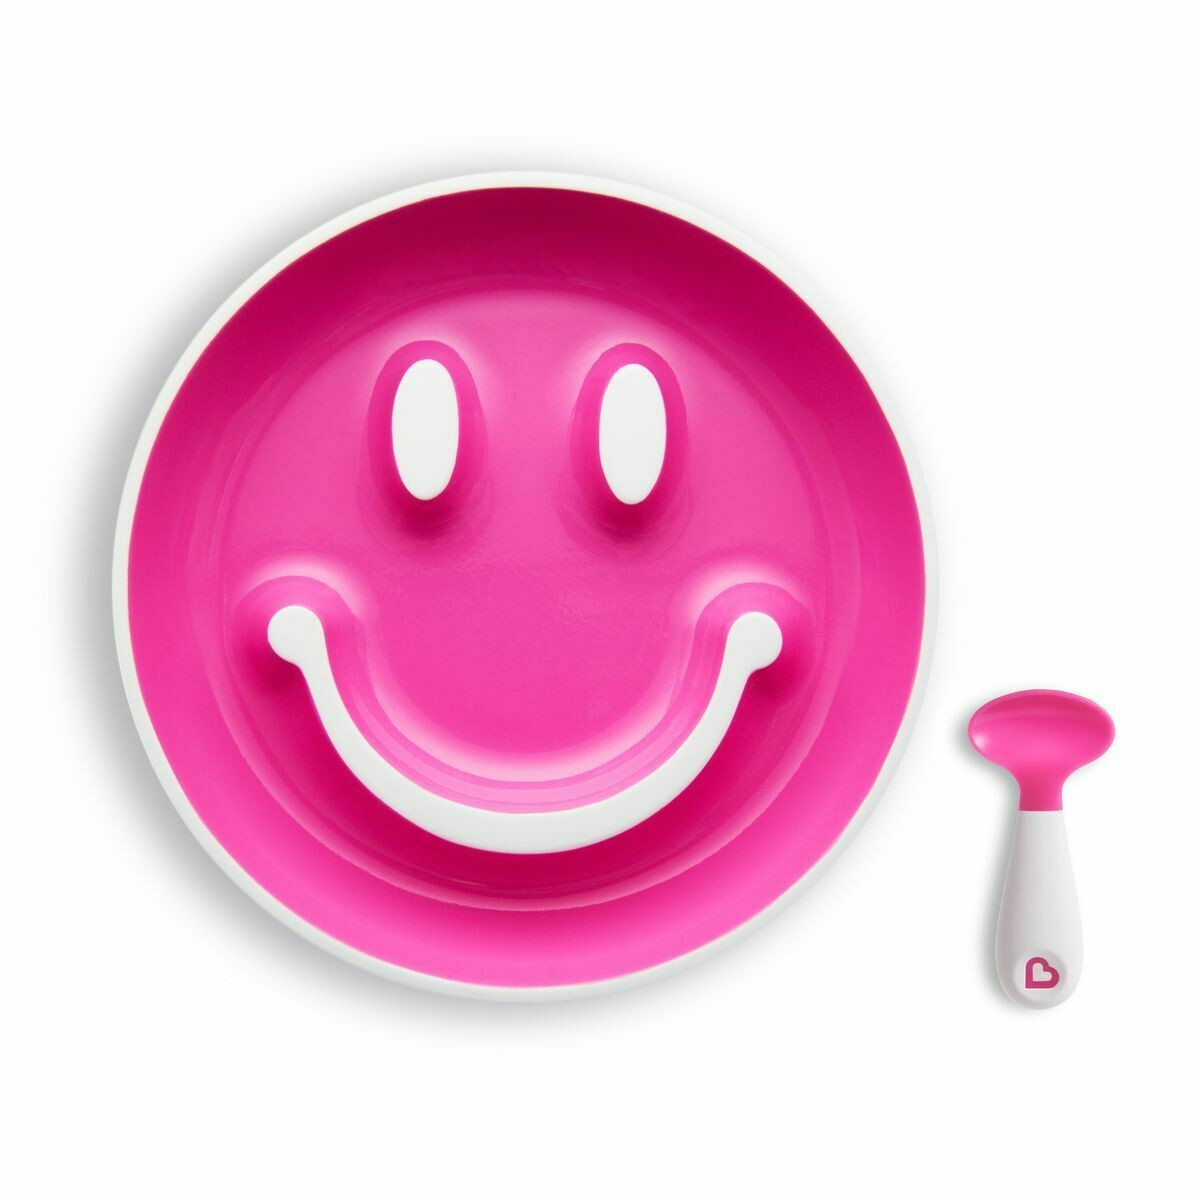 Munchkin-SMILEY PLATE